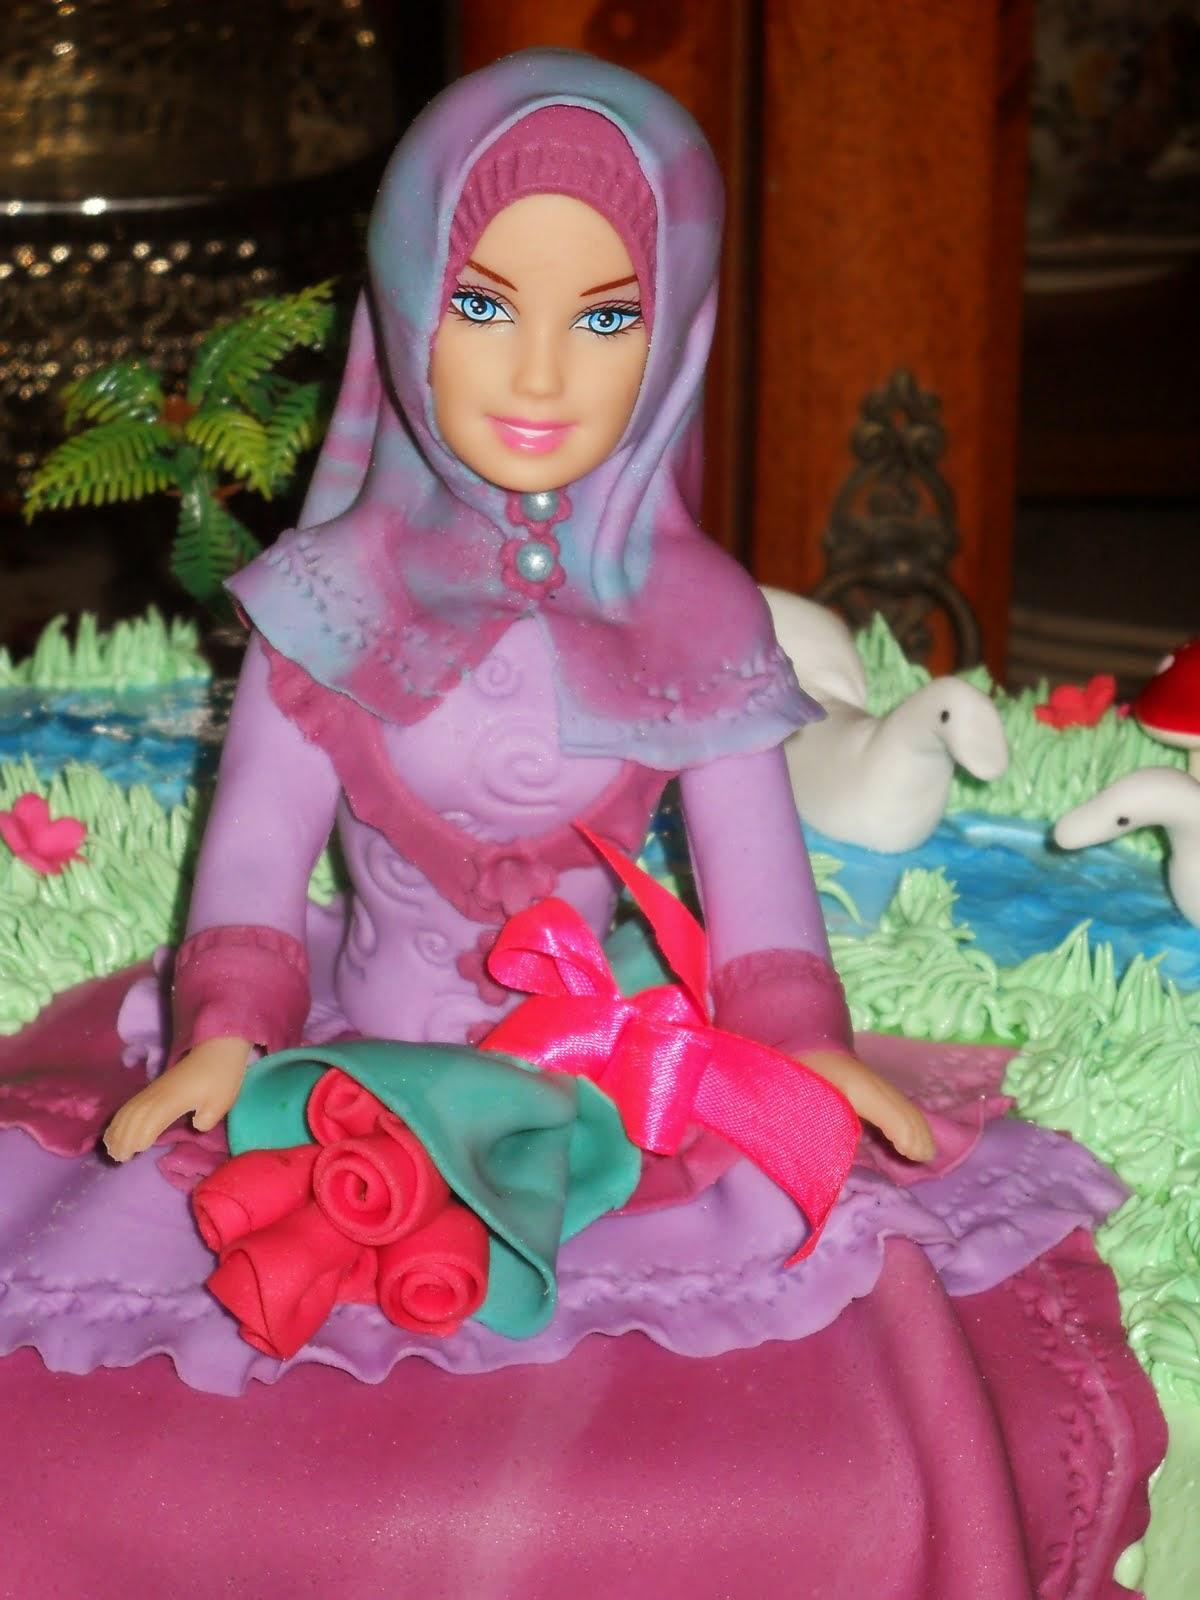 Kumpulan Gambar Boneka Barbie Muslim Cantik Dan Keren Untuk Anak